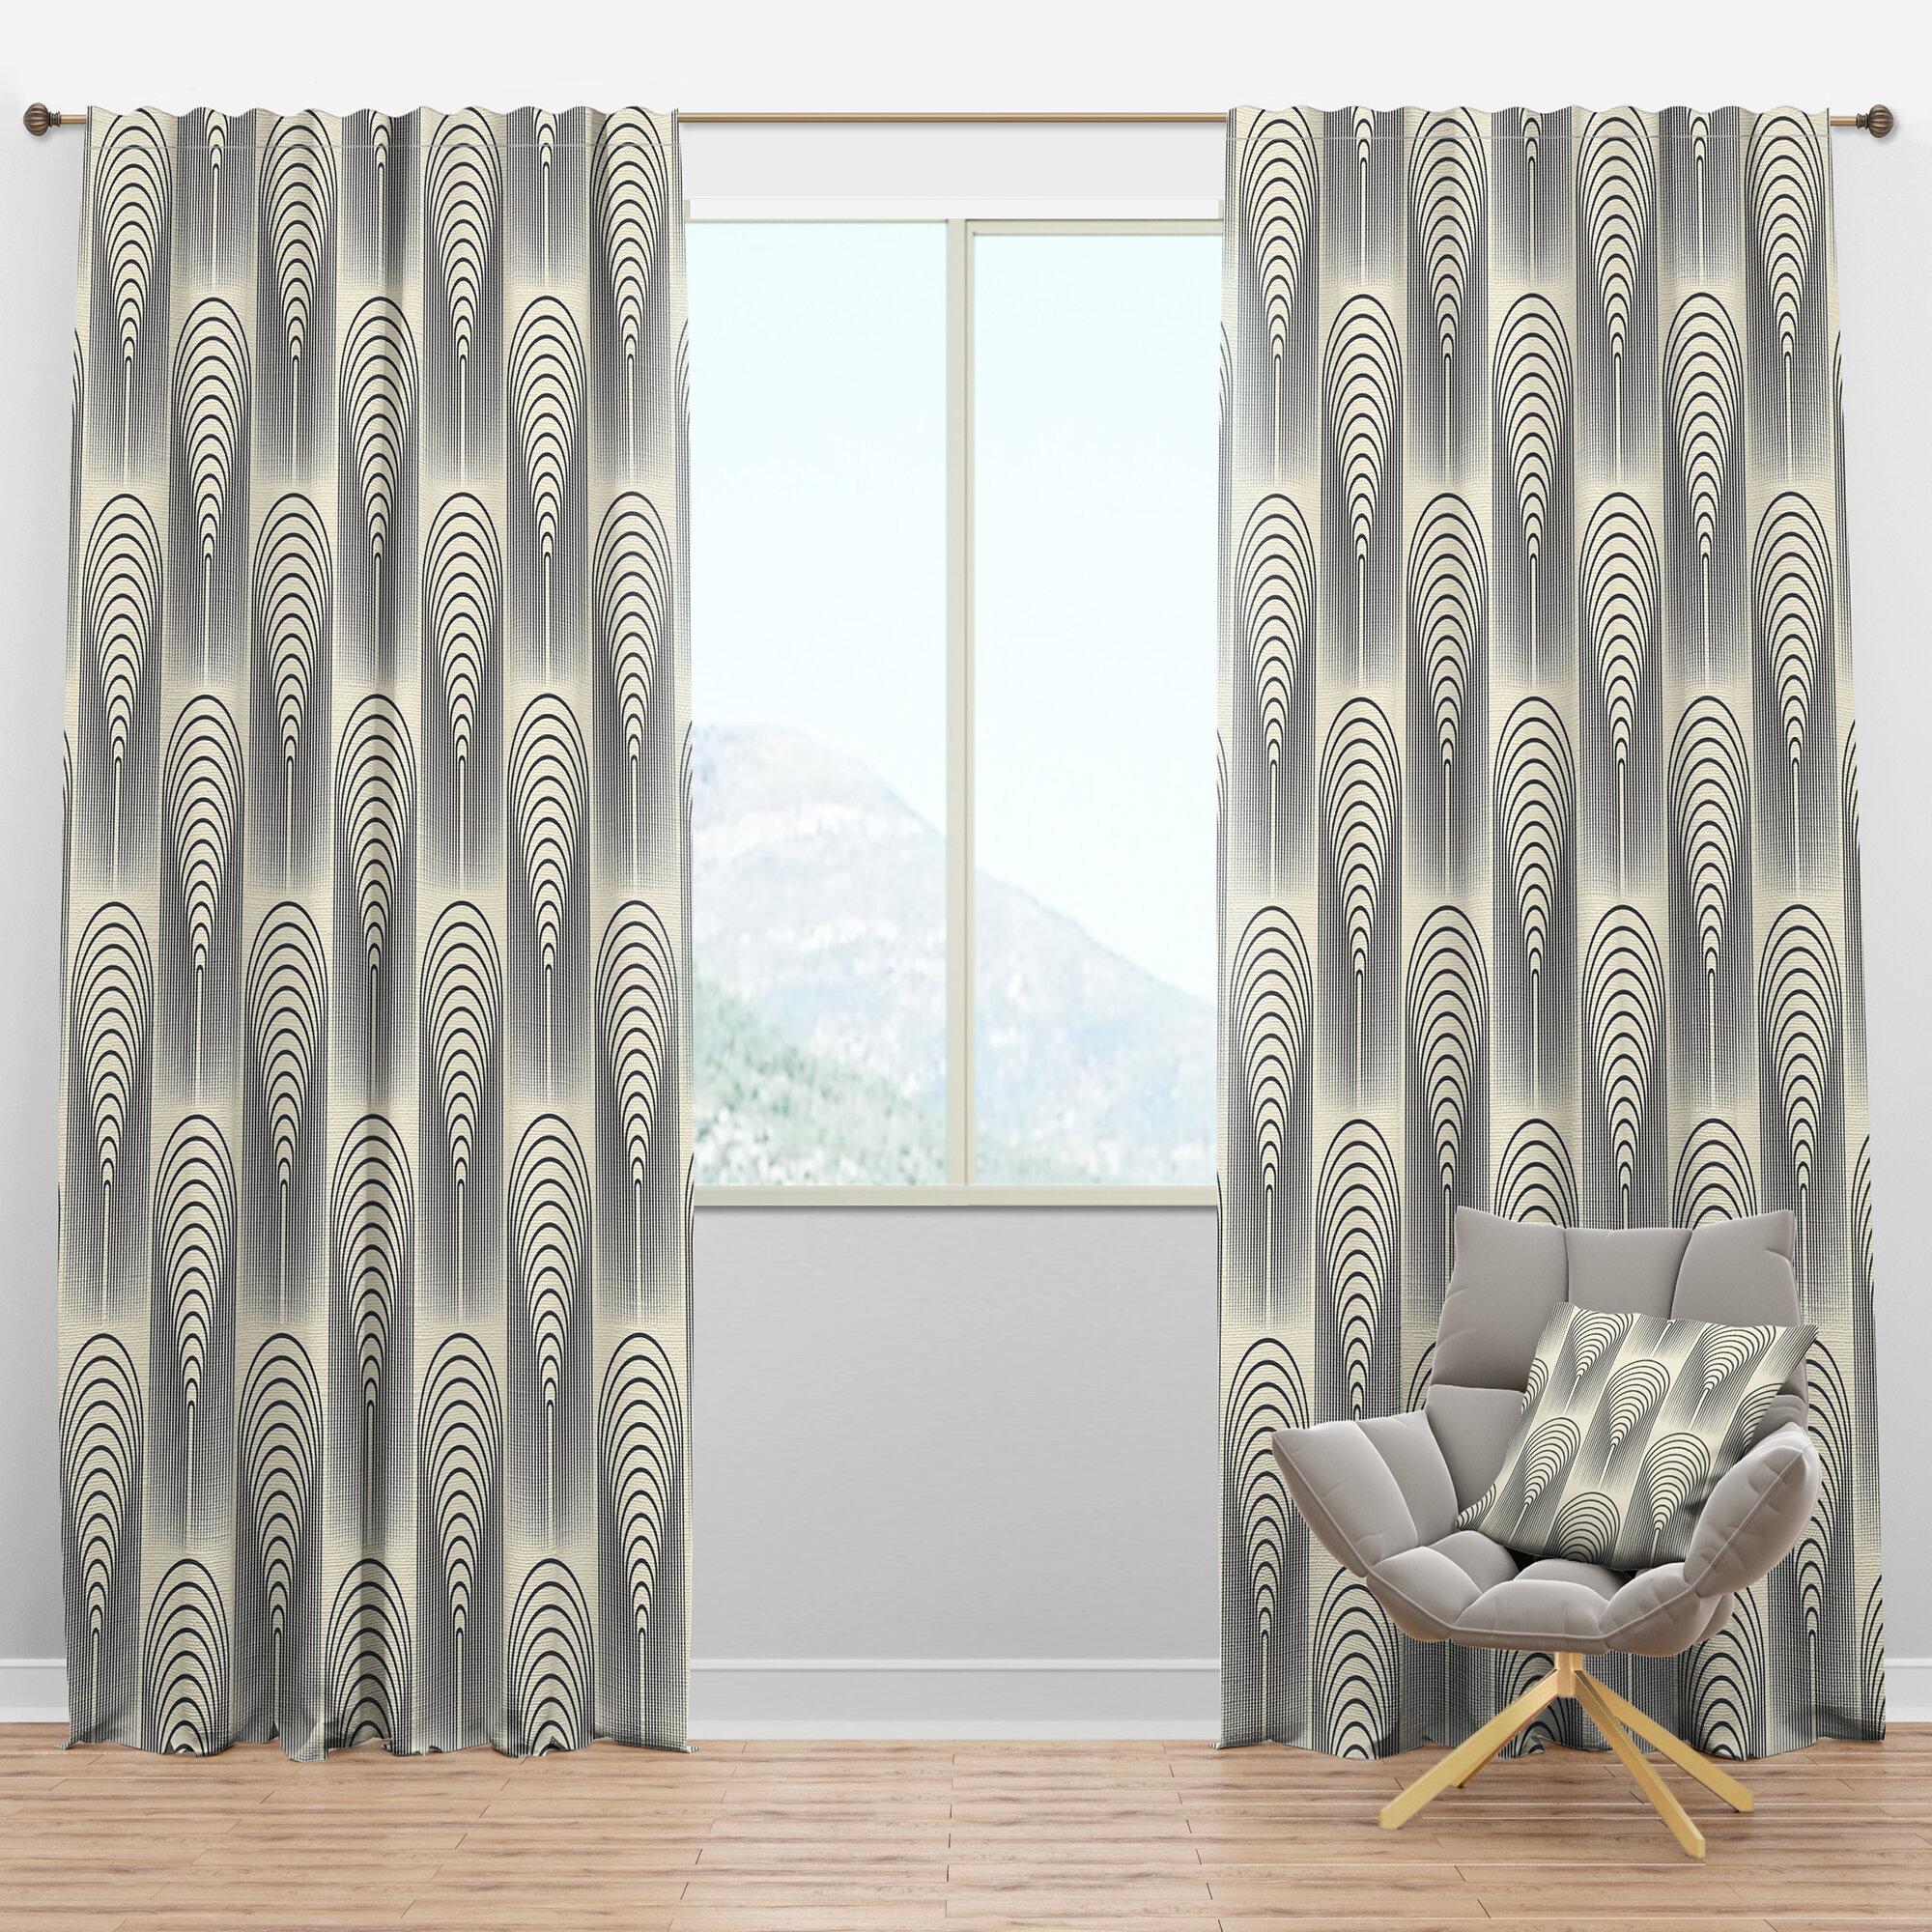 Designart Mid Century Conical Geometric Semi Sheer Thermal Rod Pocket Single Curtain Panel Wayfair